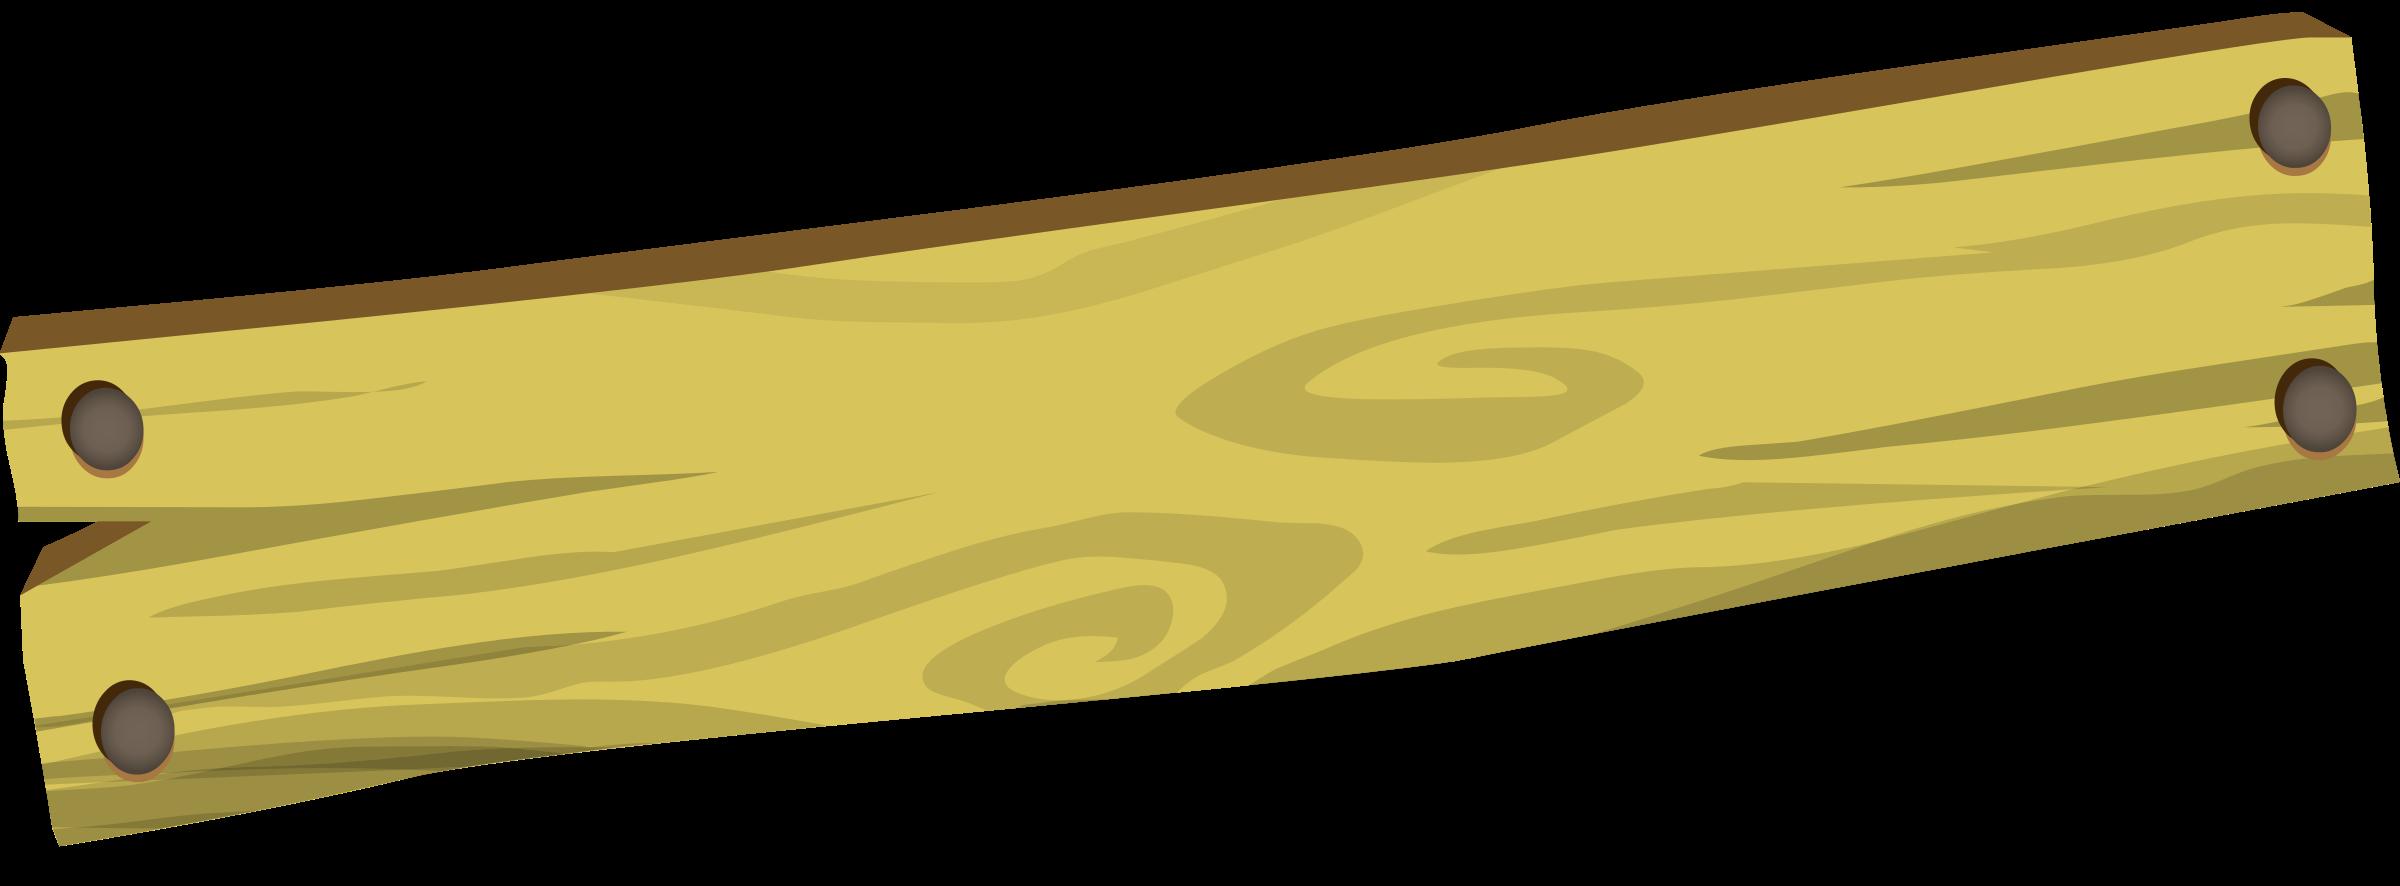 Planks clipart blank #5